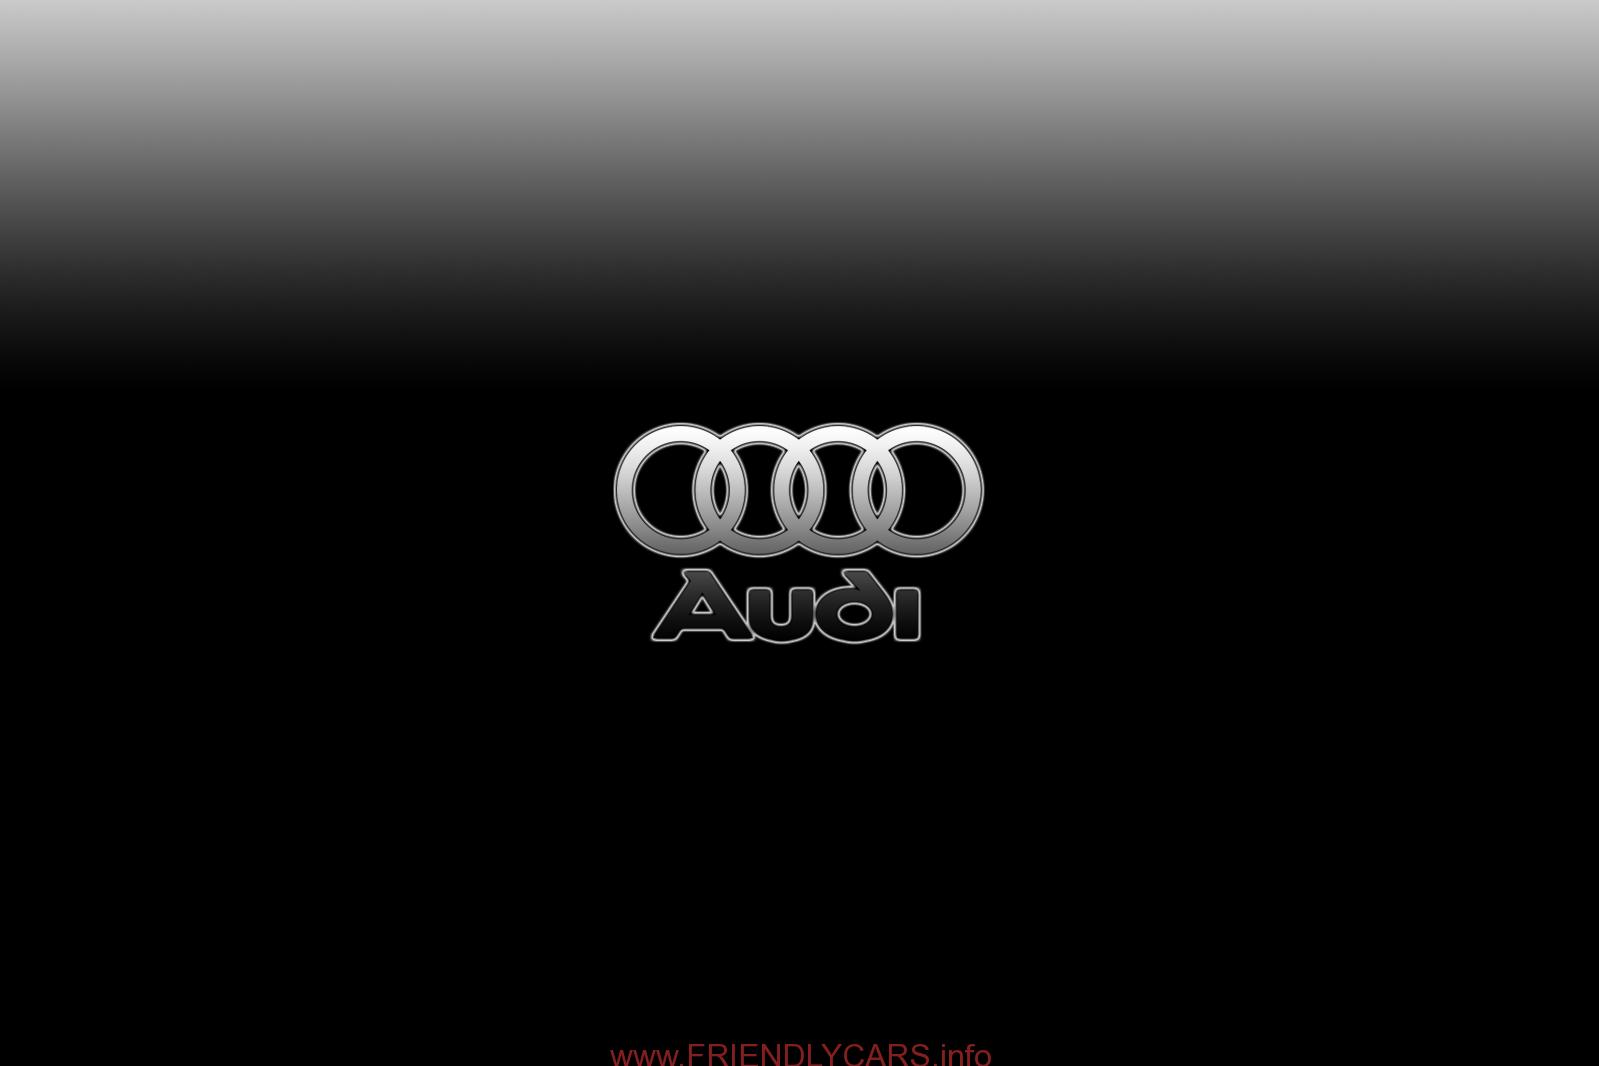 Nice Mercedes Benz Logo Vector Car Images Hd Audi Logo The Car Logo